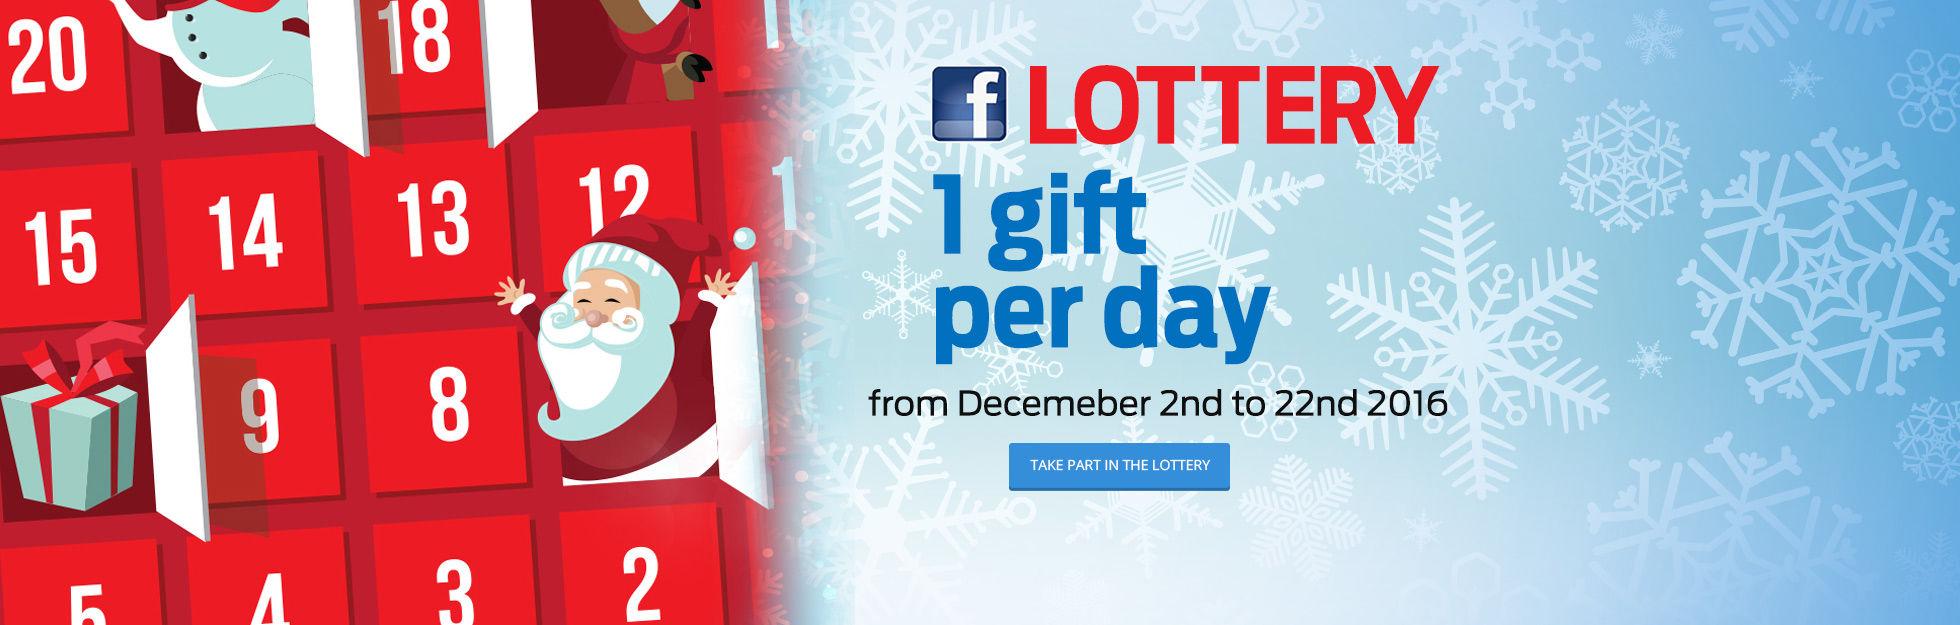 1 Gift per day